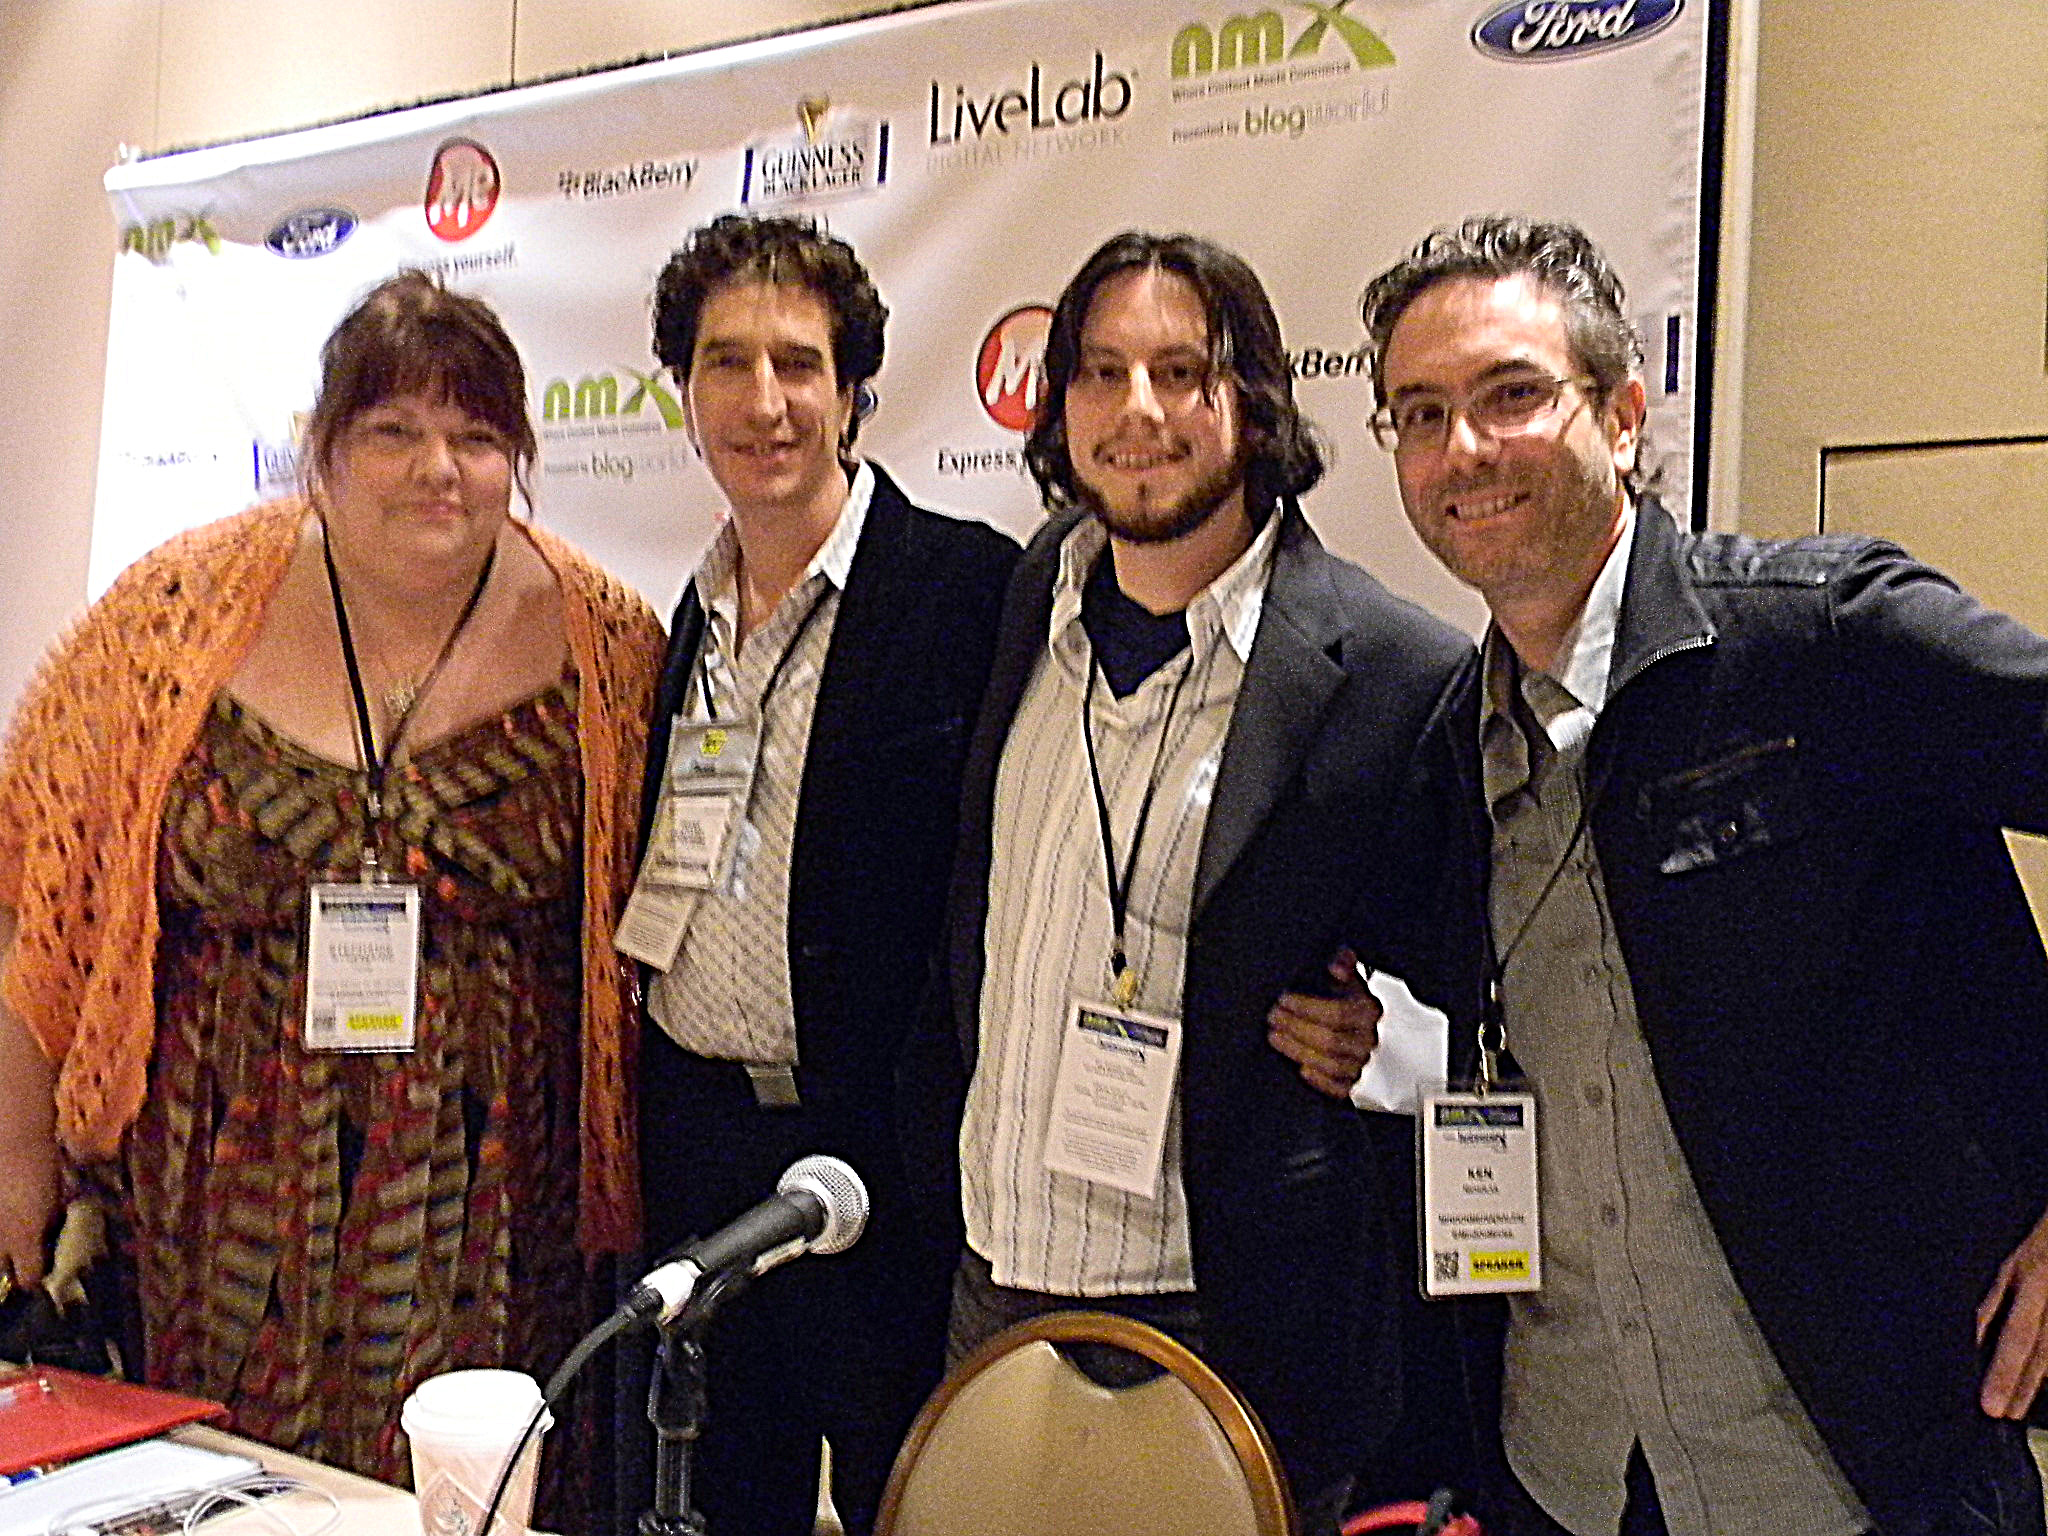 Stephanie Piche, Frank Chindamo, Avi Glijansky and Ken Nicholas at NMX 2013 in Las Vegas, NV